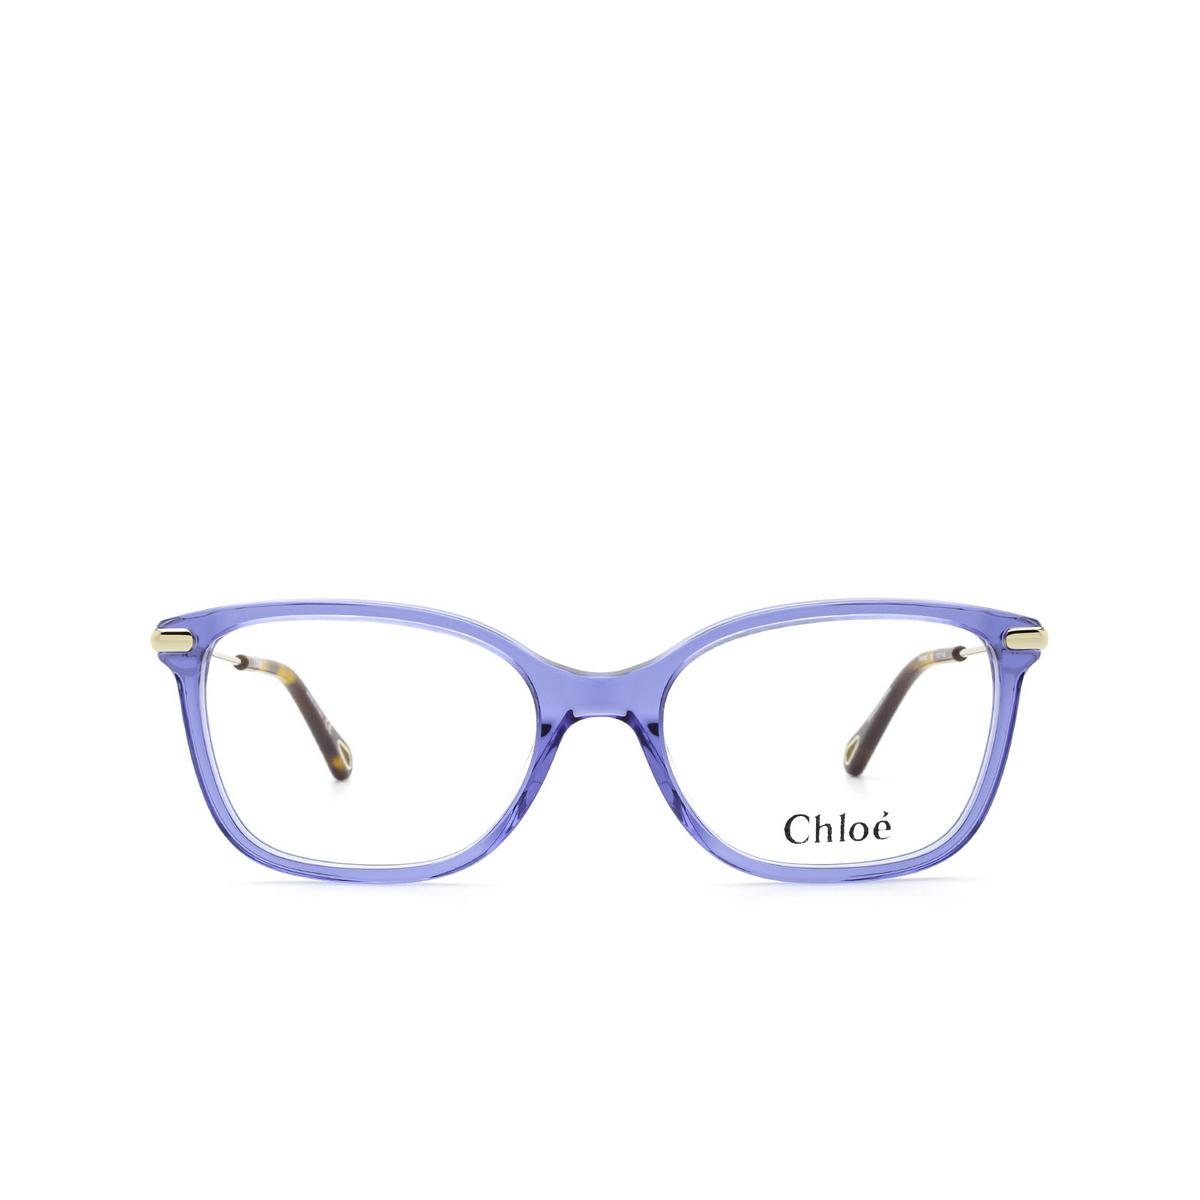 Chloé® Rectangle Eyeglasses: CH0059O color Blue 008 - front view.